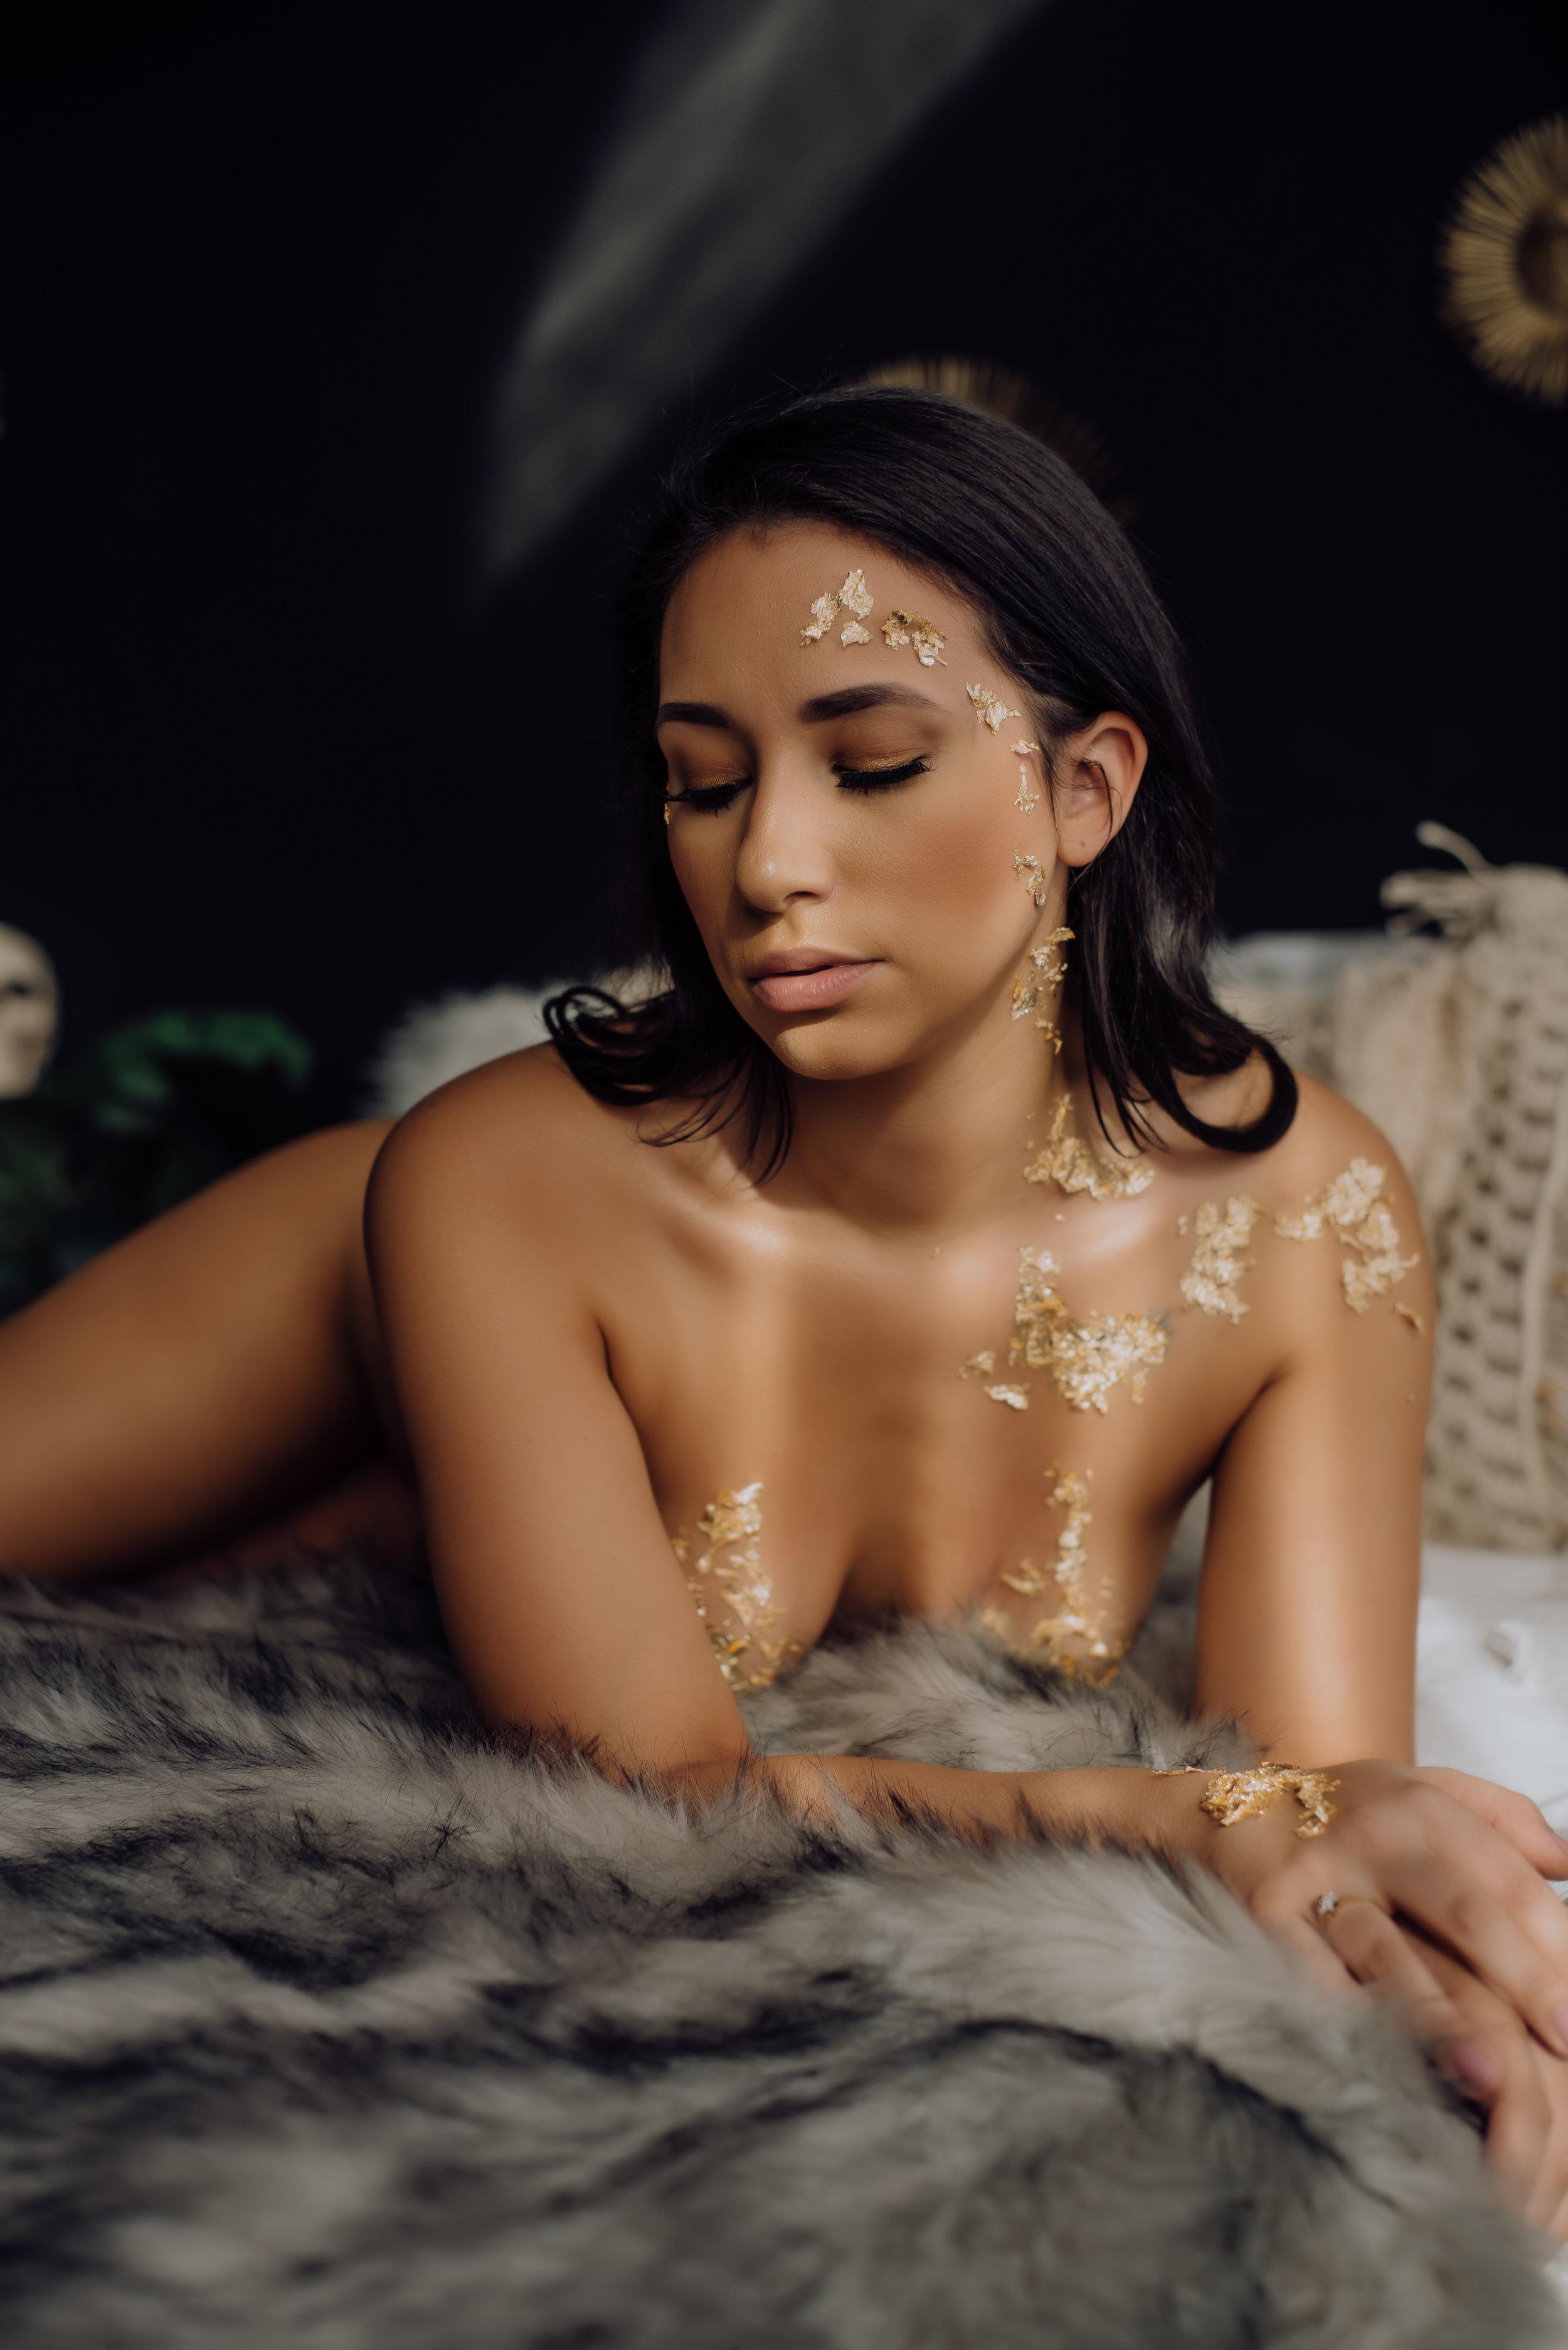 boudoir-photographer-gold-foil-69.jpg